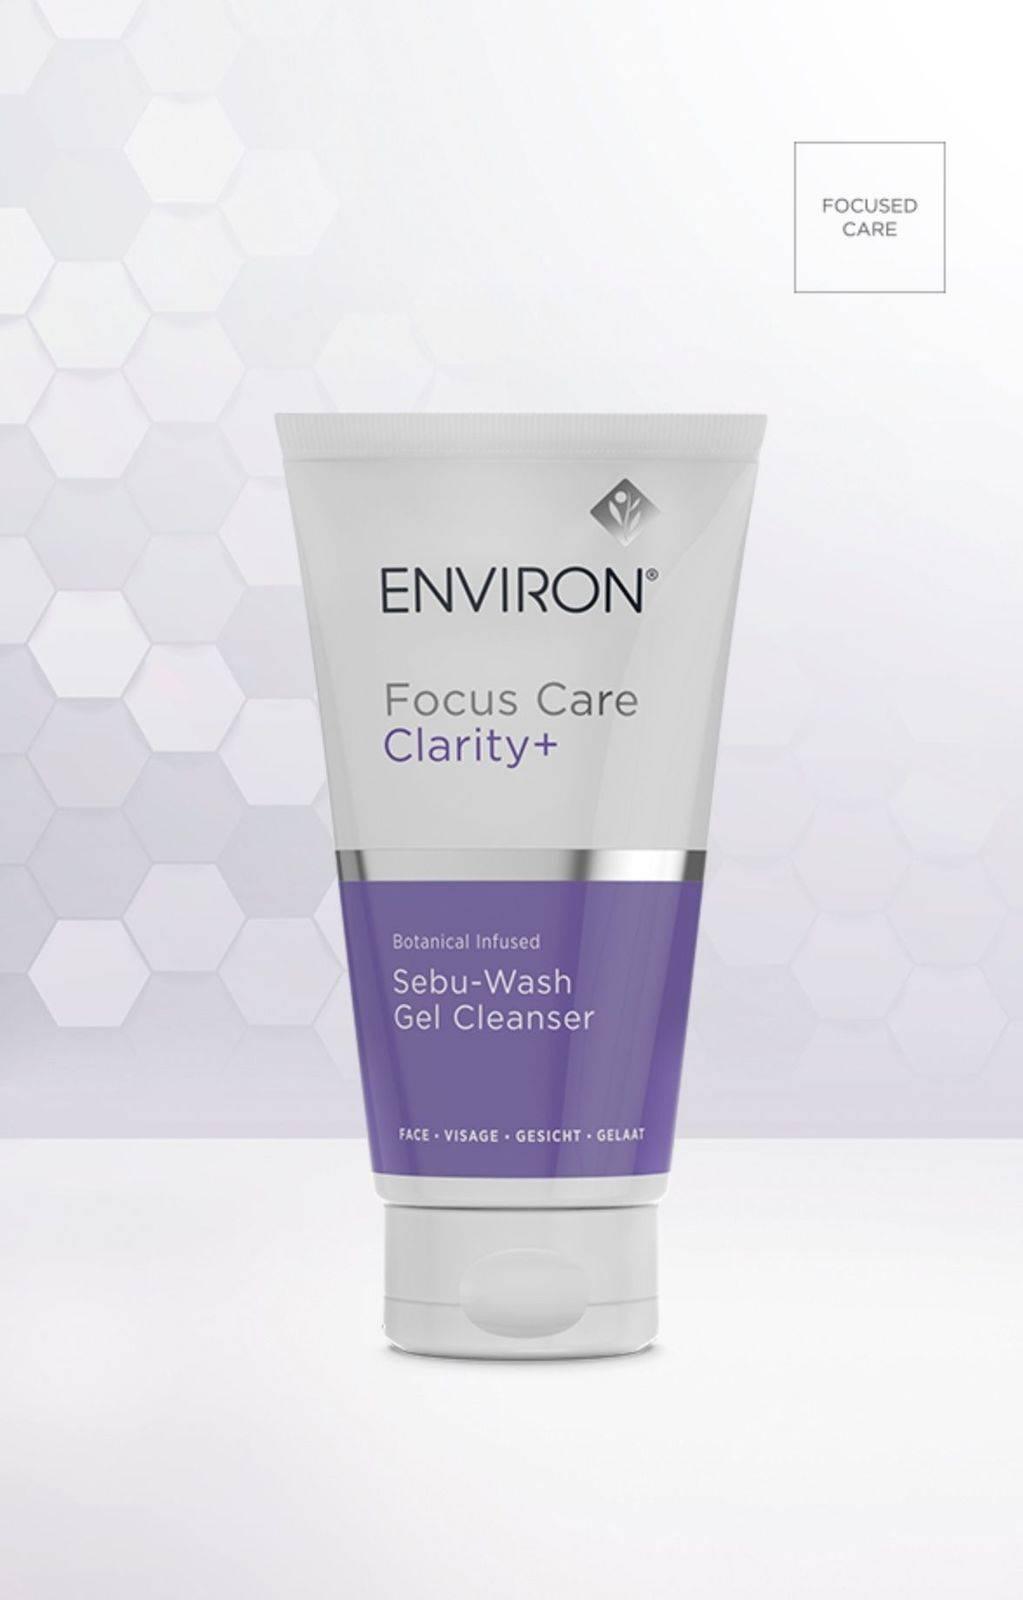 Focus Care Clarity+ Bontanical Infused Sebu-Wash Gel Cleanser